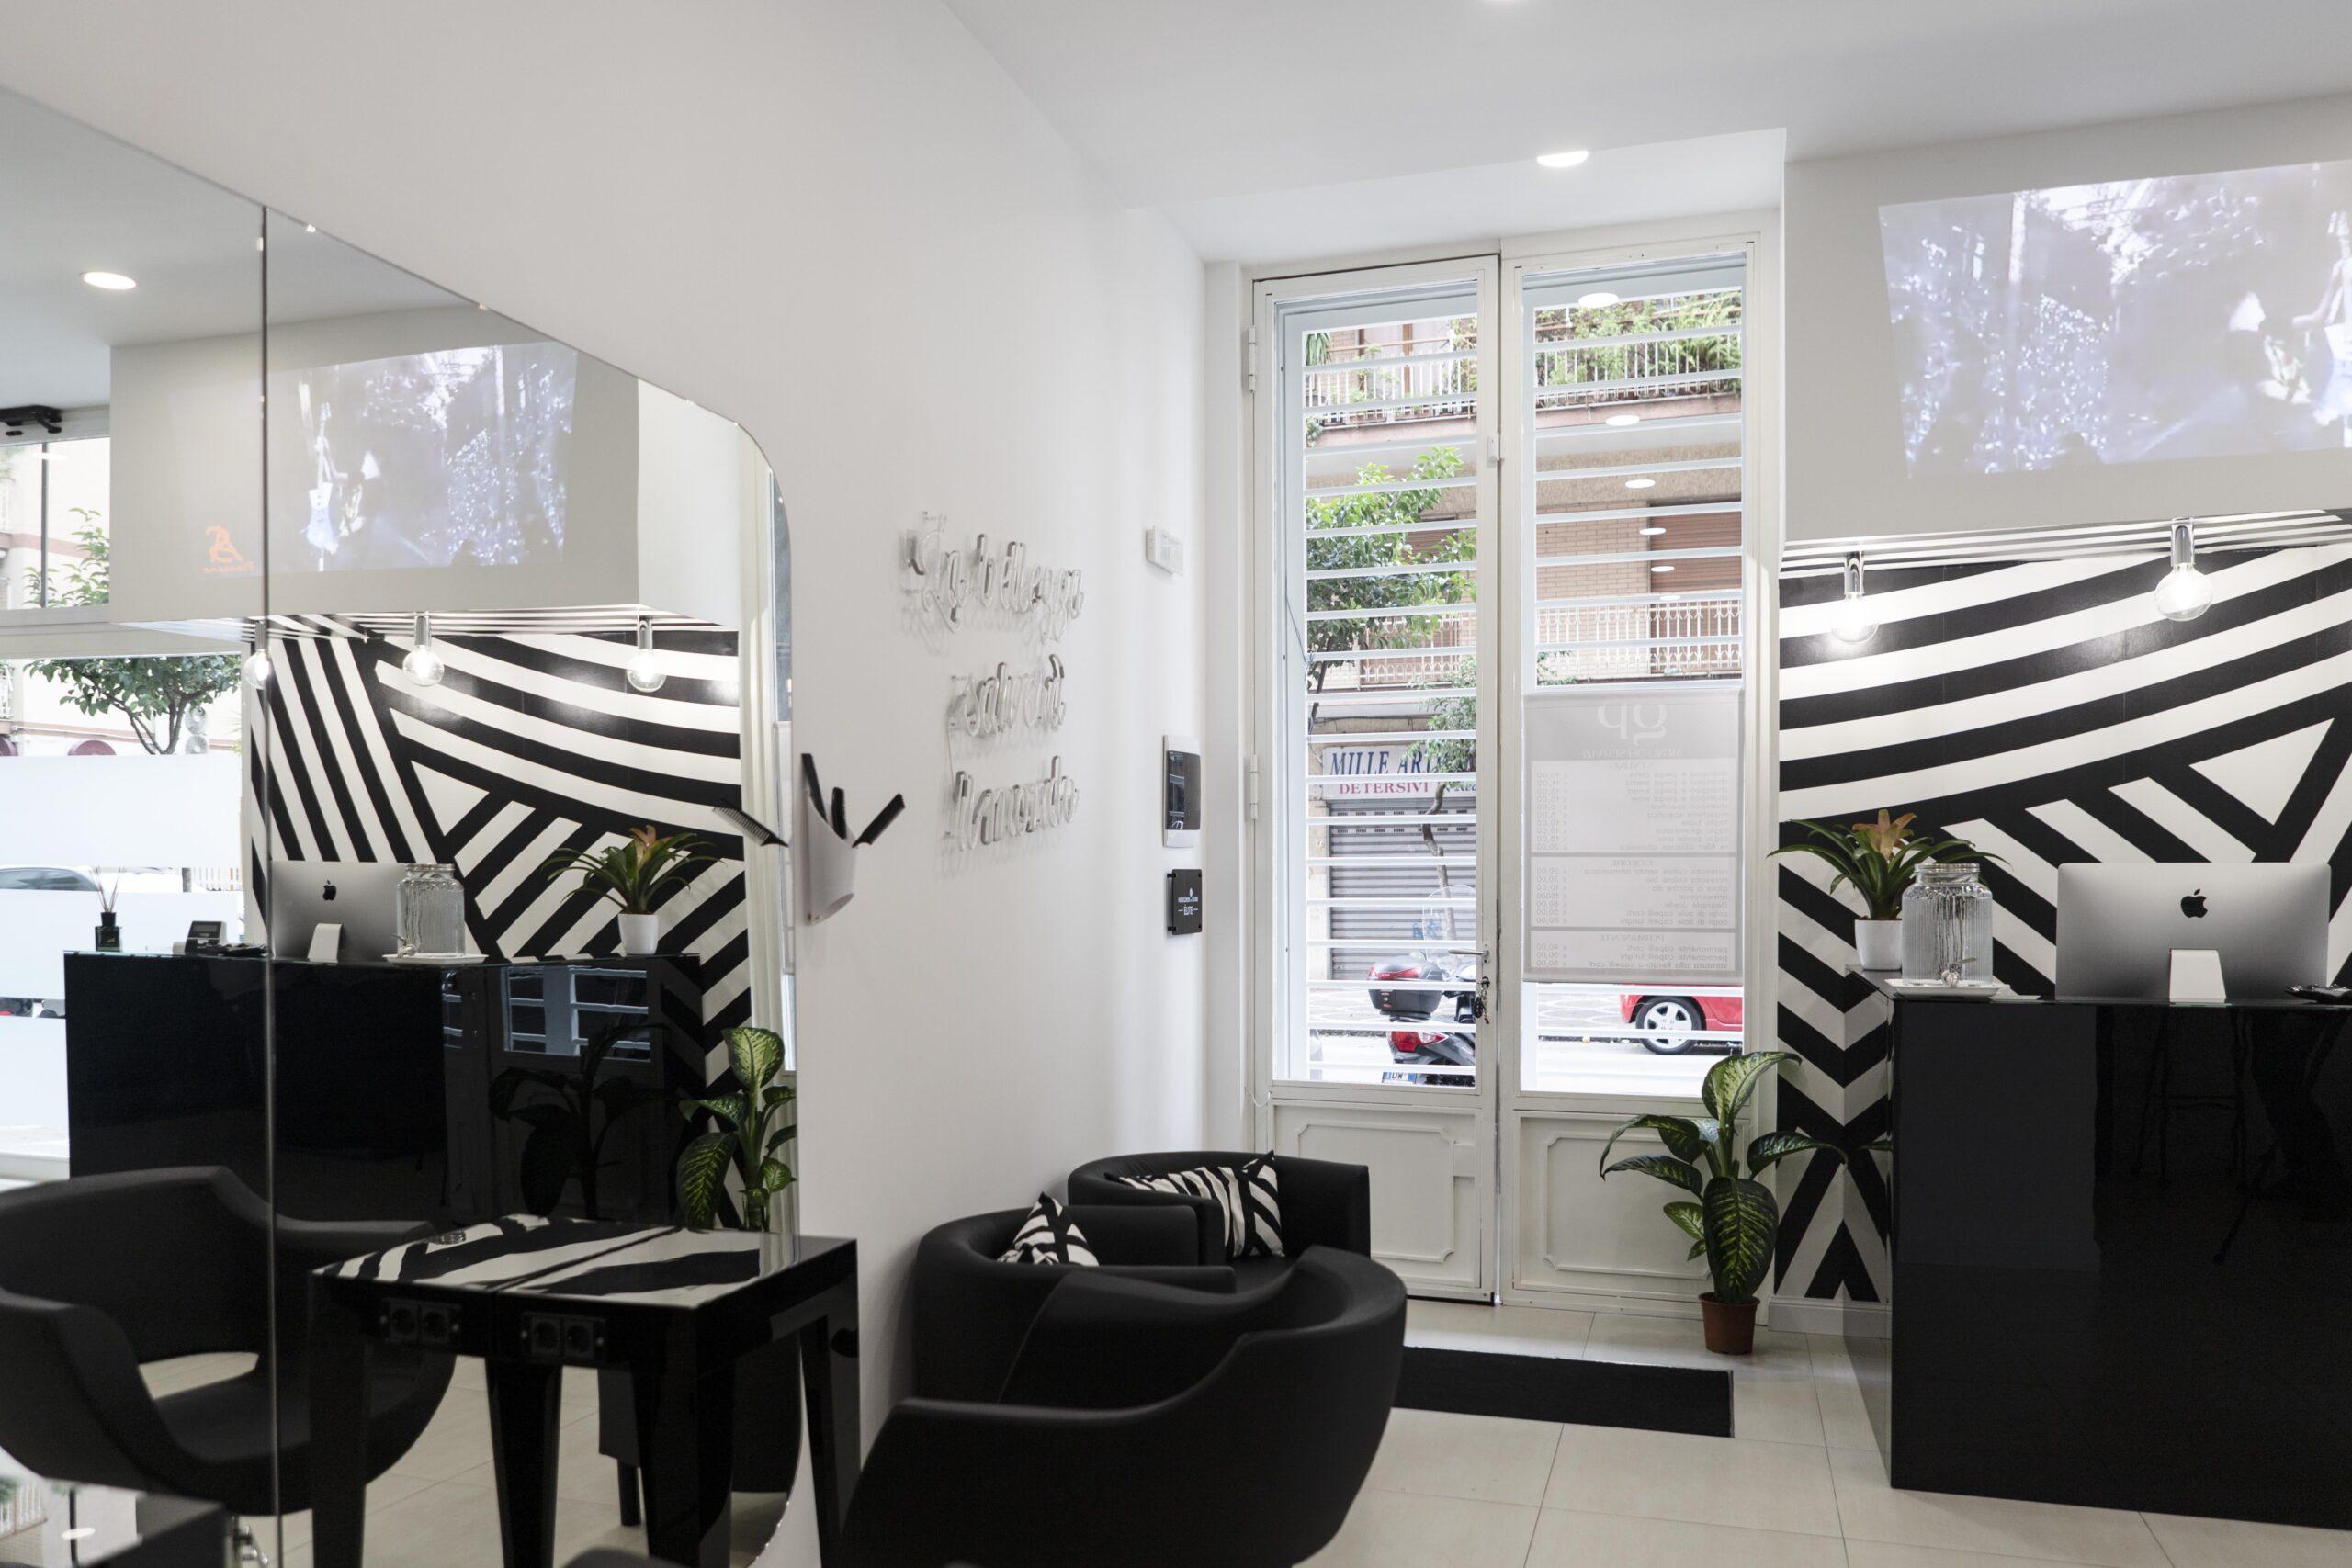 Hair Salon interior design